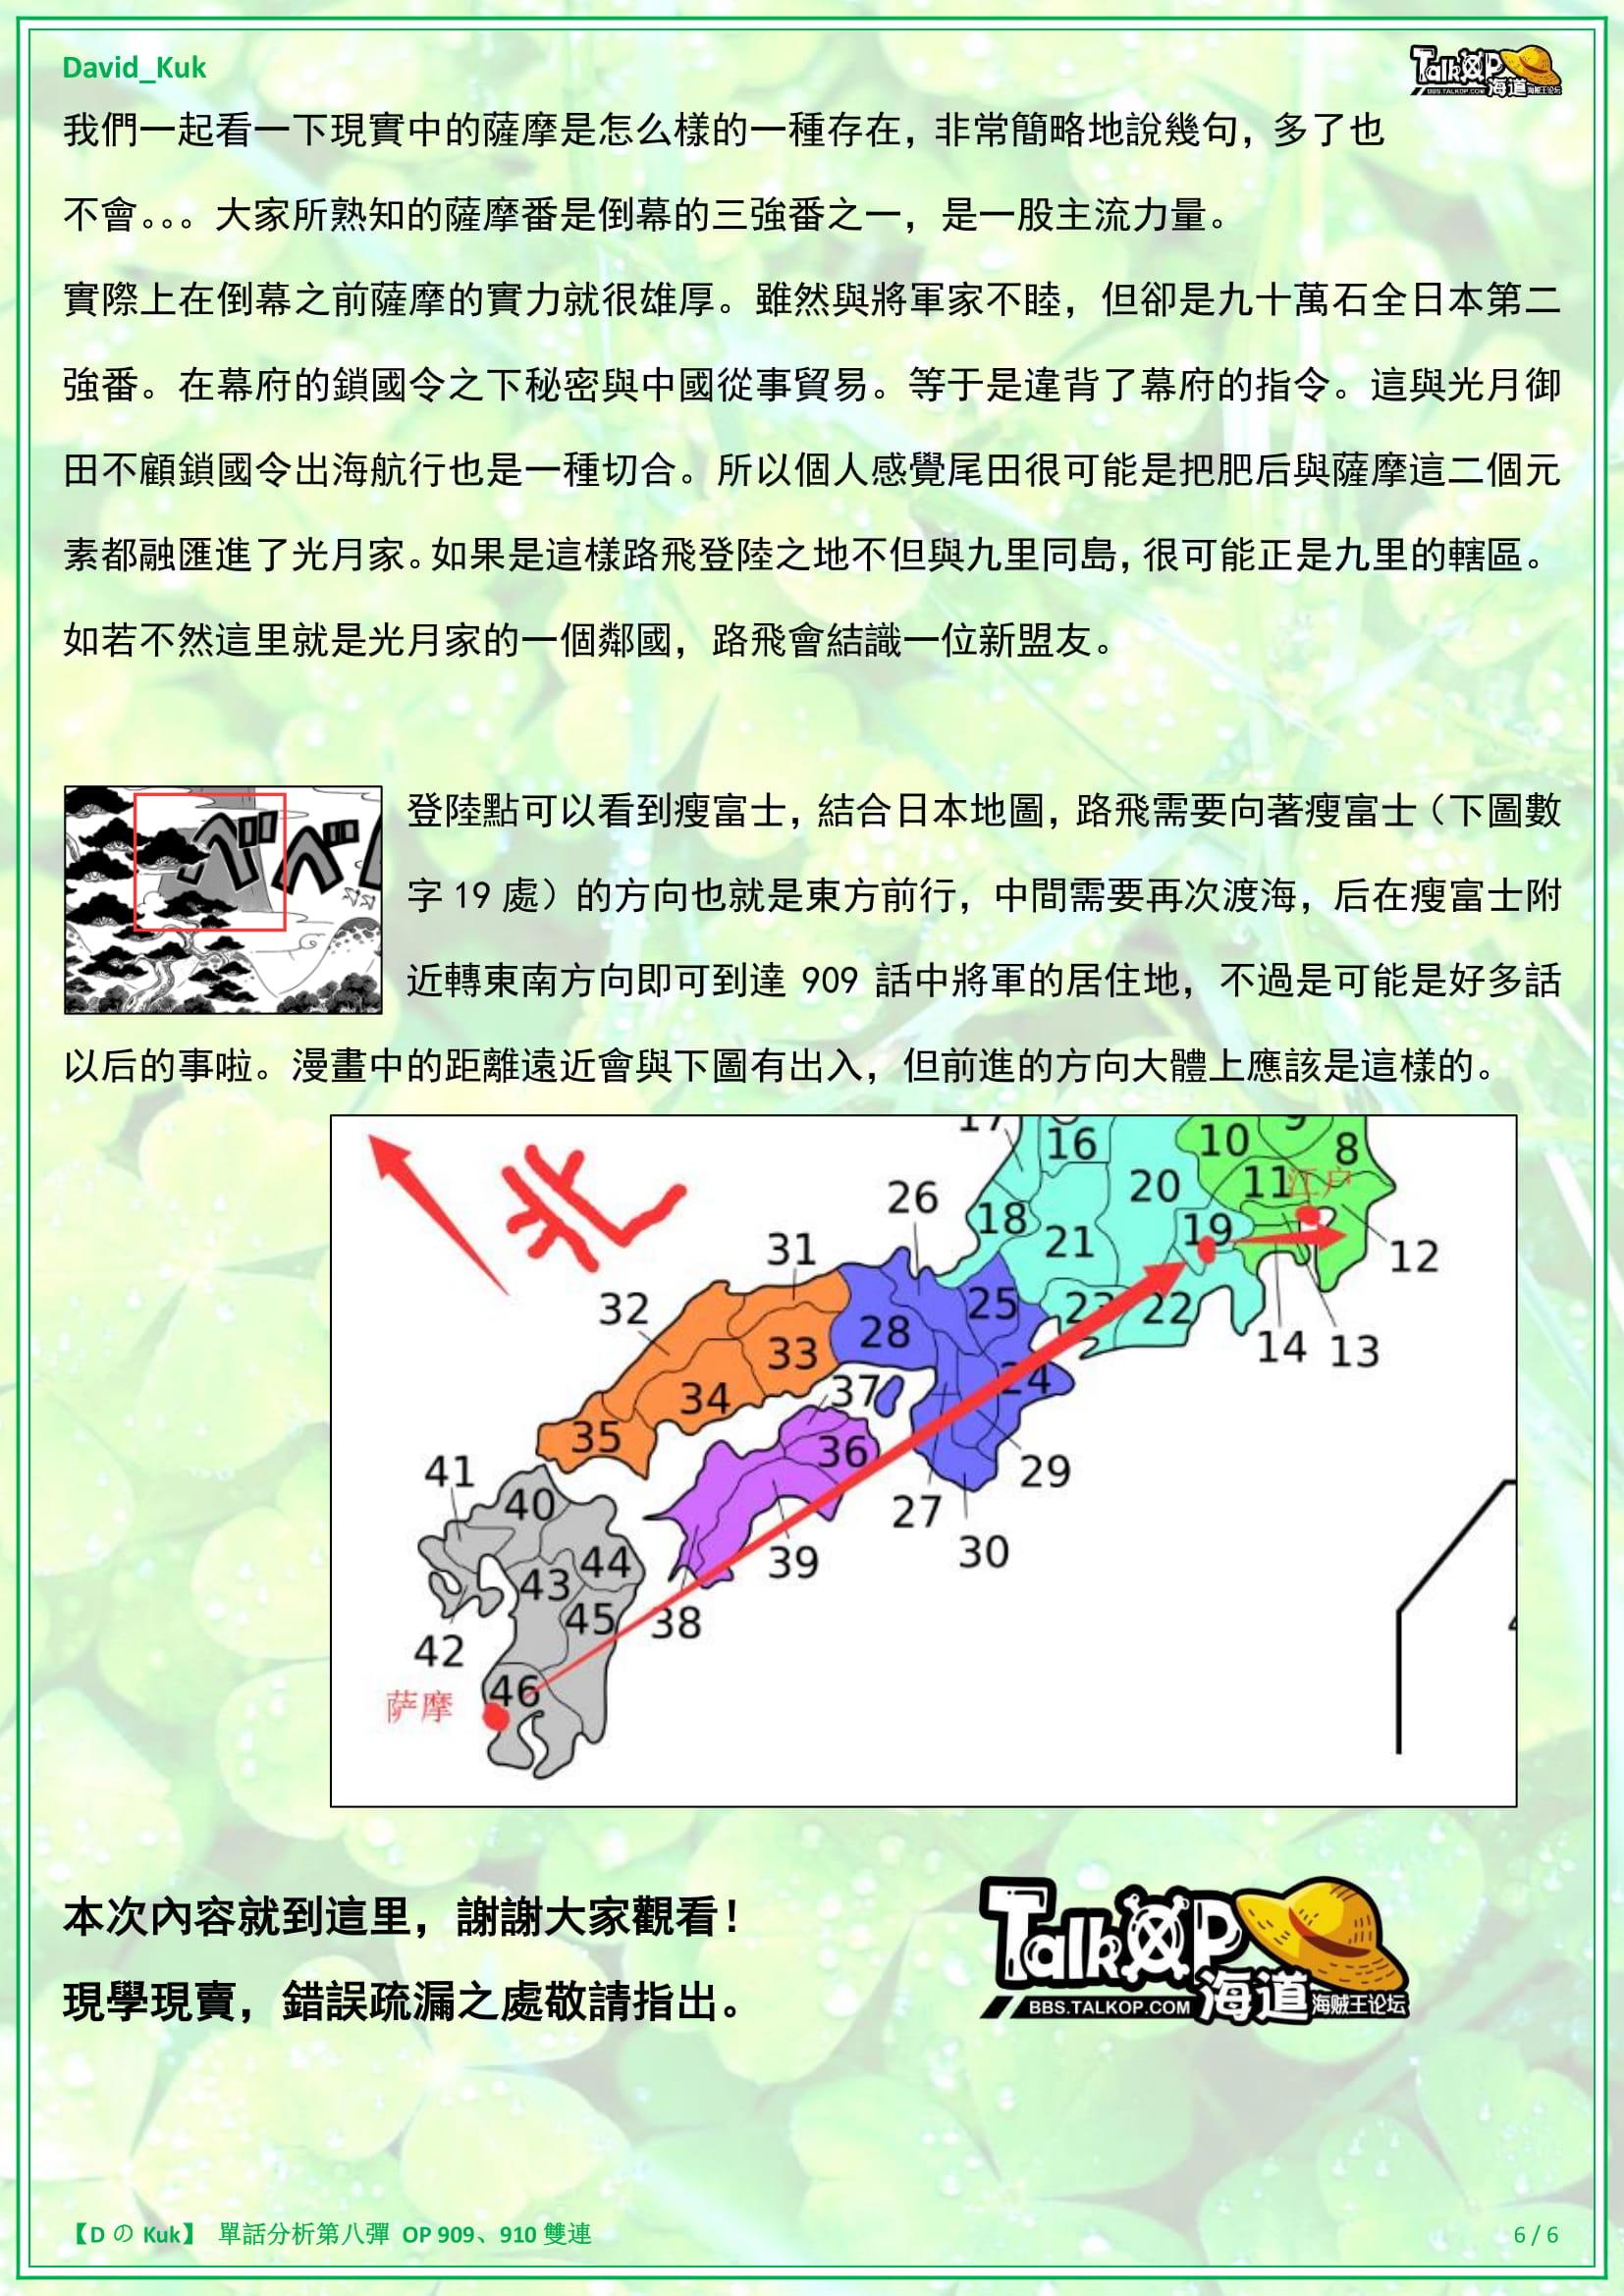 【DのKuk】 單話分析第八彈 OP909、910雙連v2.-6.jpg